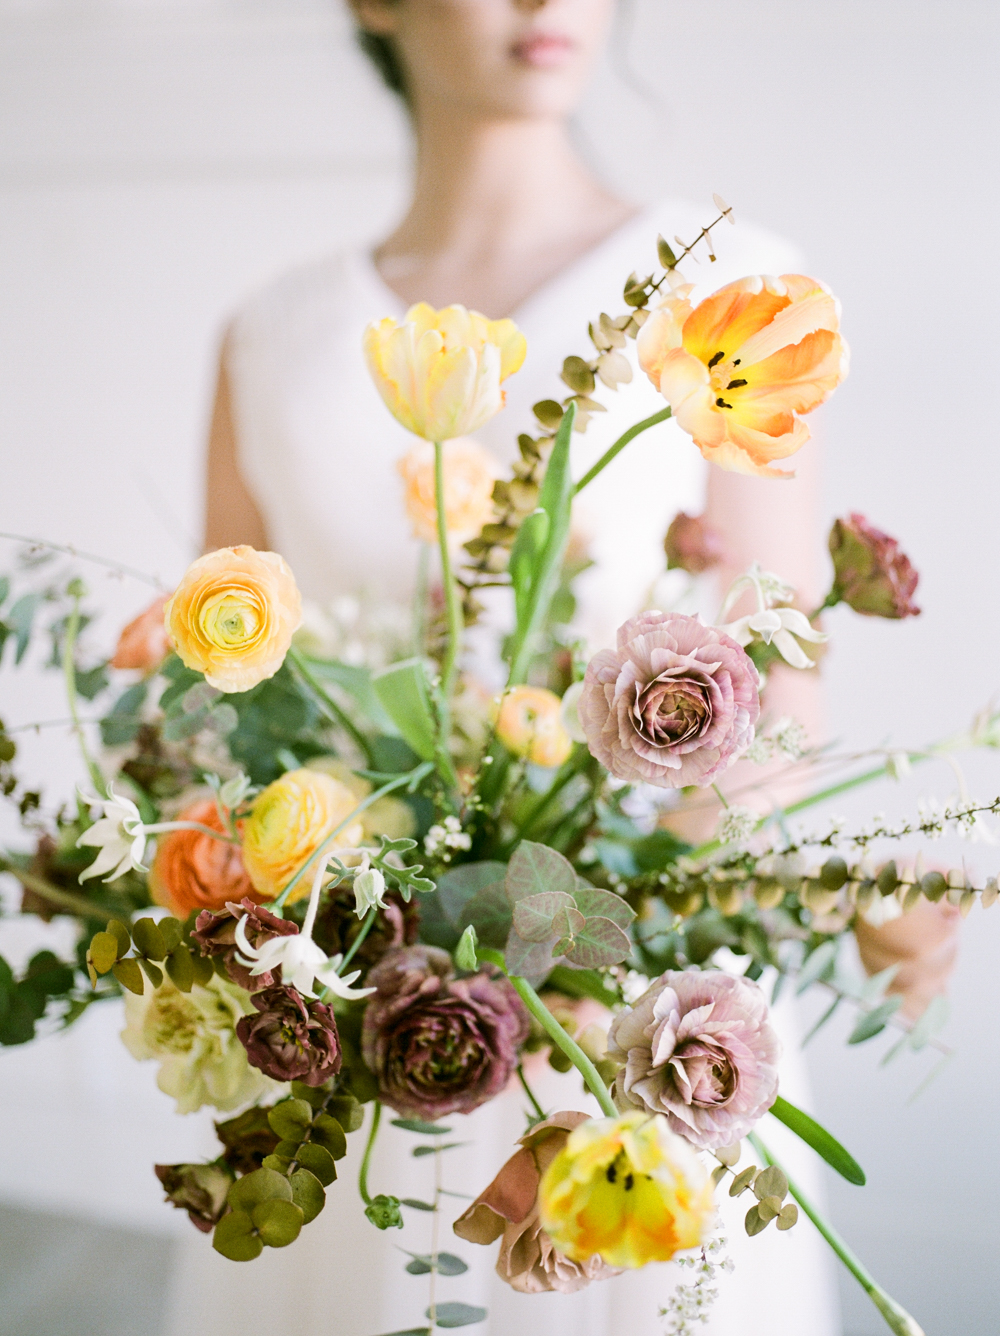 christine-gosch-utah-wedding-photographer-film-photographer-salt-lake-city-spring-utah-wedding-bridal-session-9.jpg